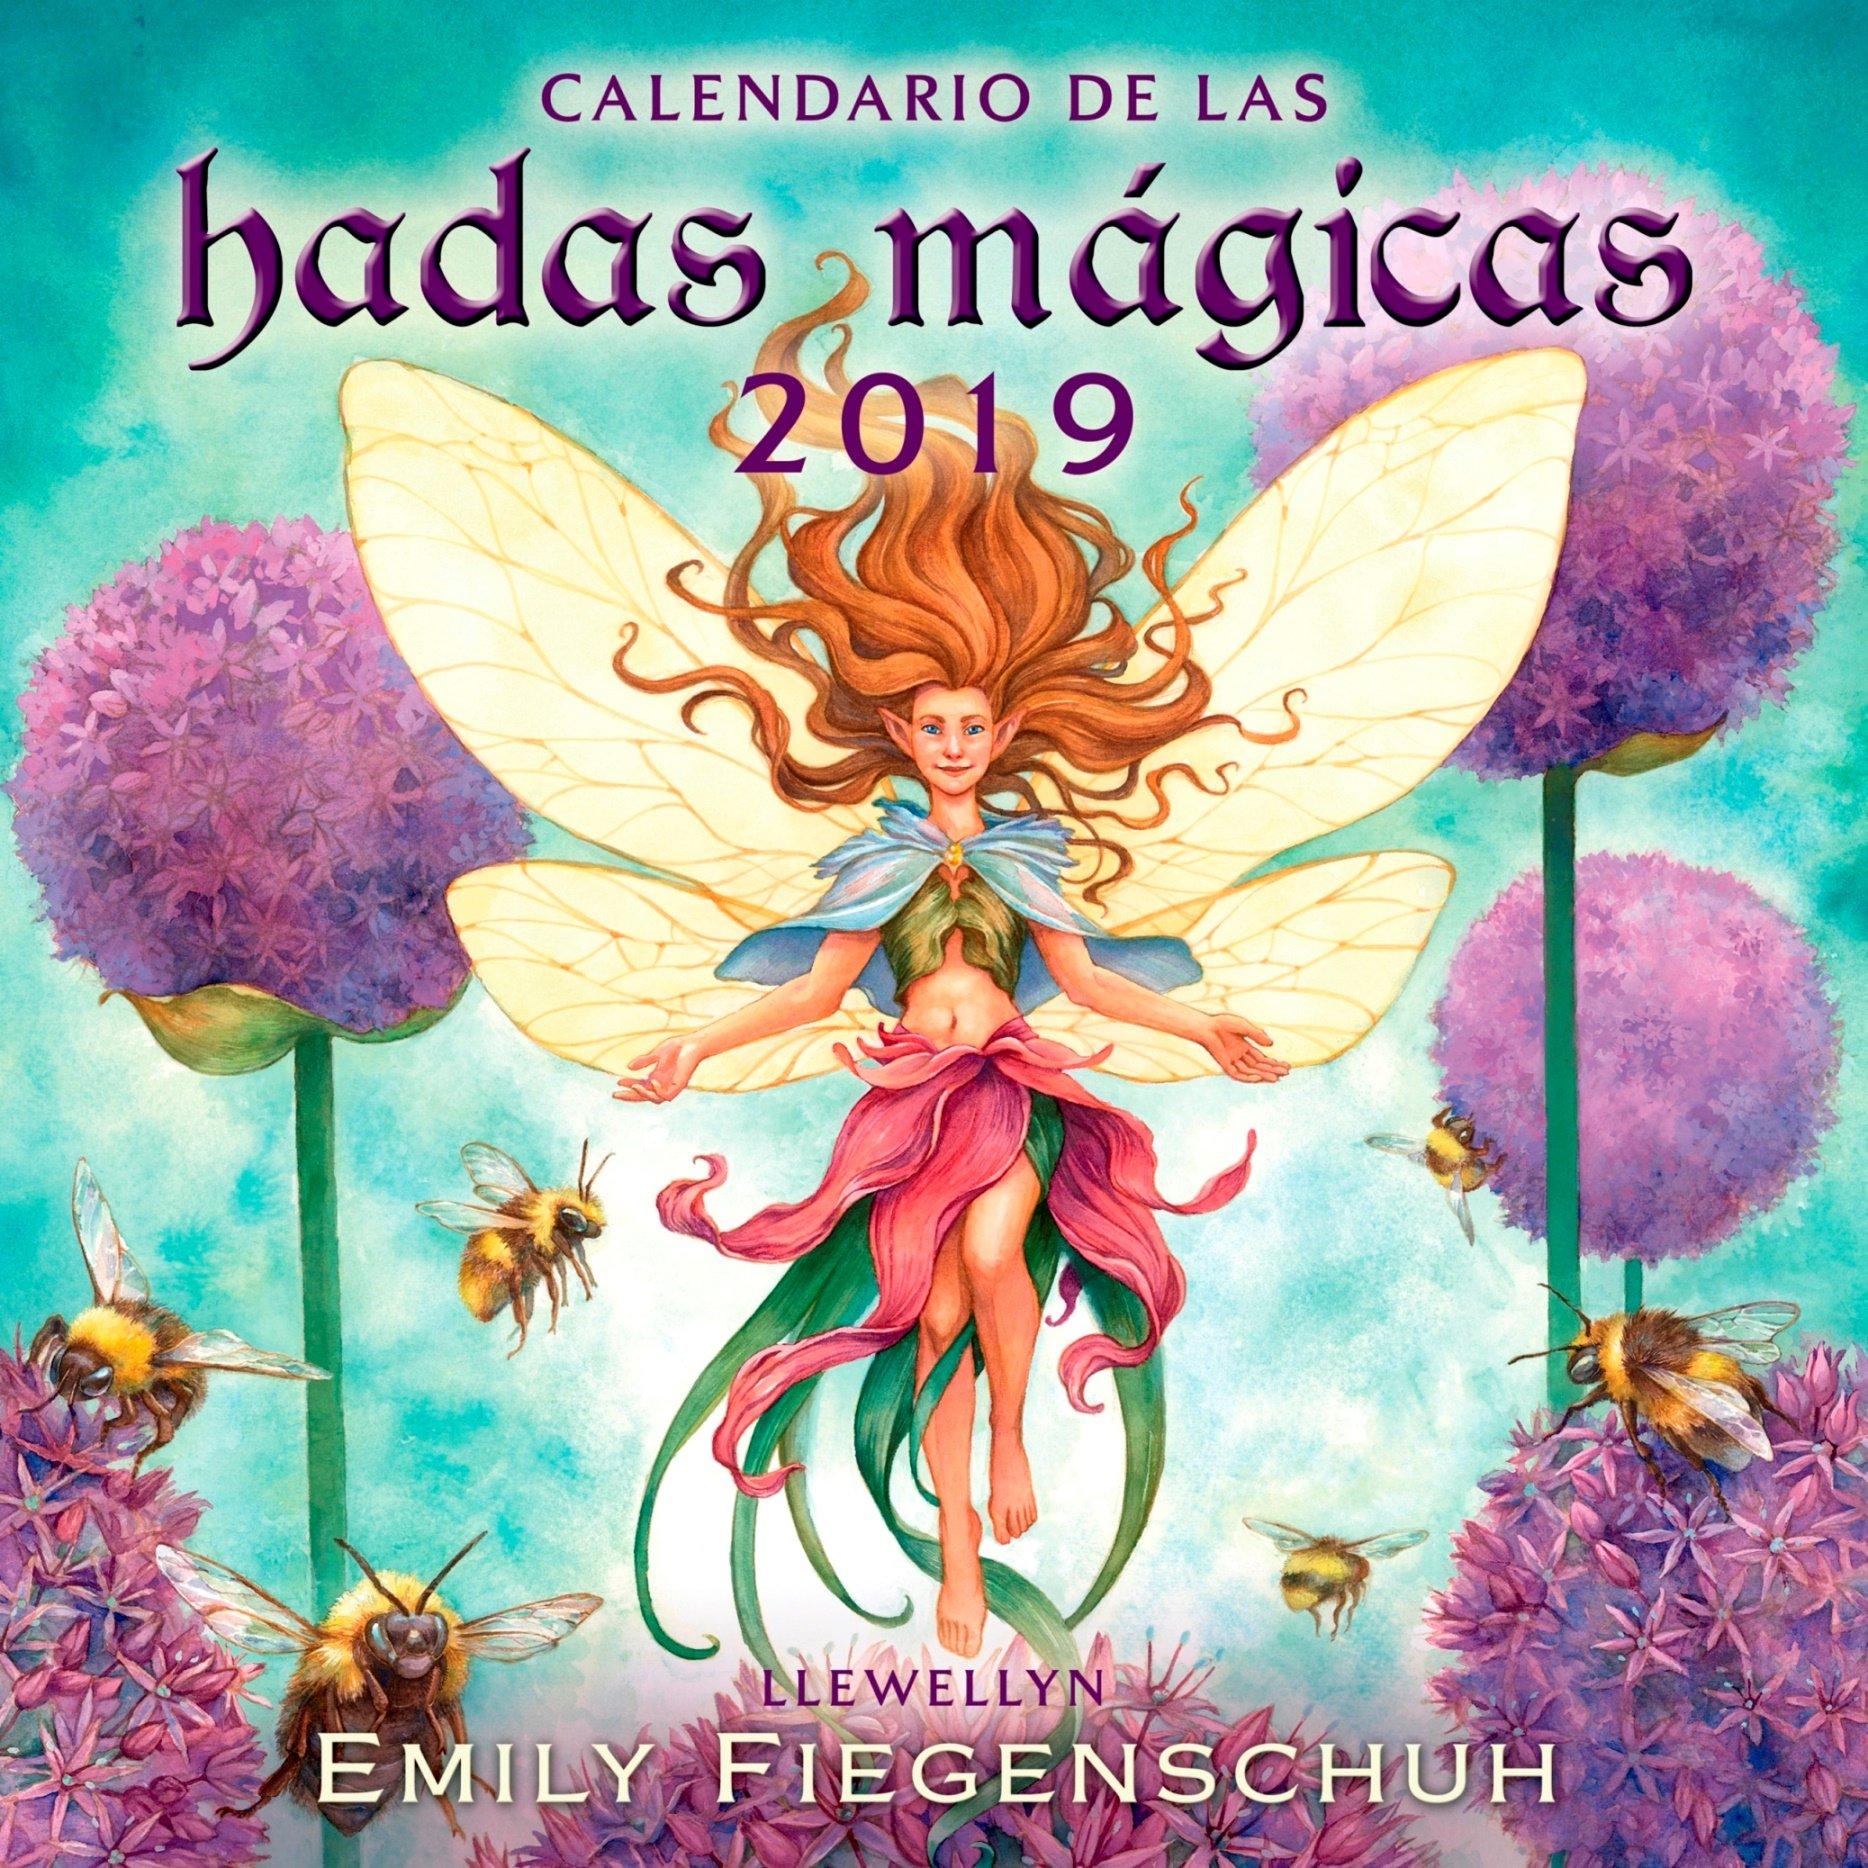 Calendario de las Hadas mágicas 2019 (AGENDAS) Tapa blanda – Calendario mural, 3 sep 2018 Llewellyn EDICIONES OBELISCO S.L. 8491113649 NON-CLASSIFIABLE